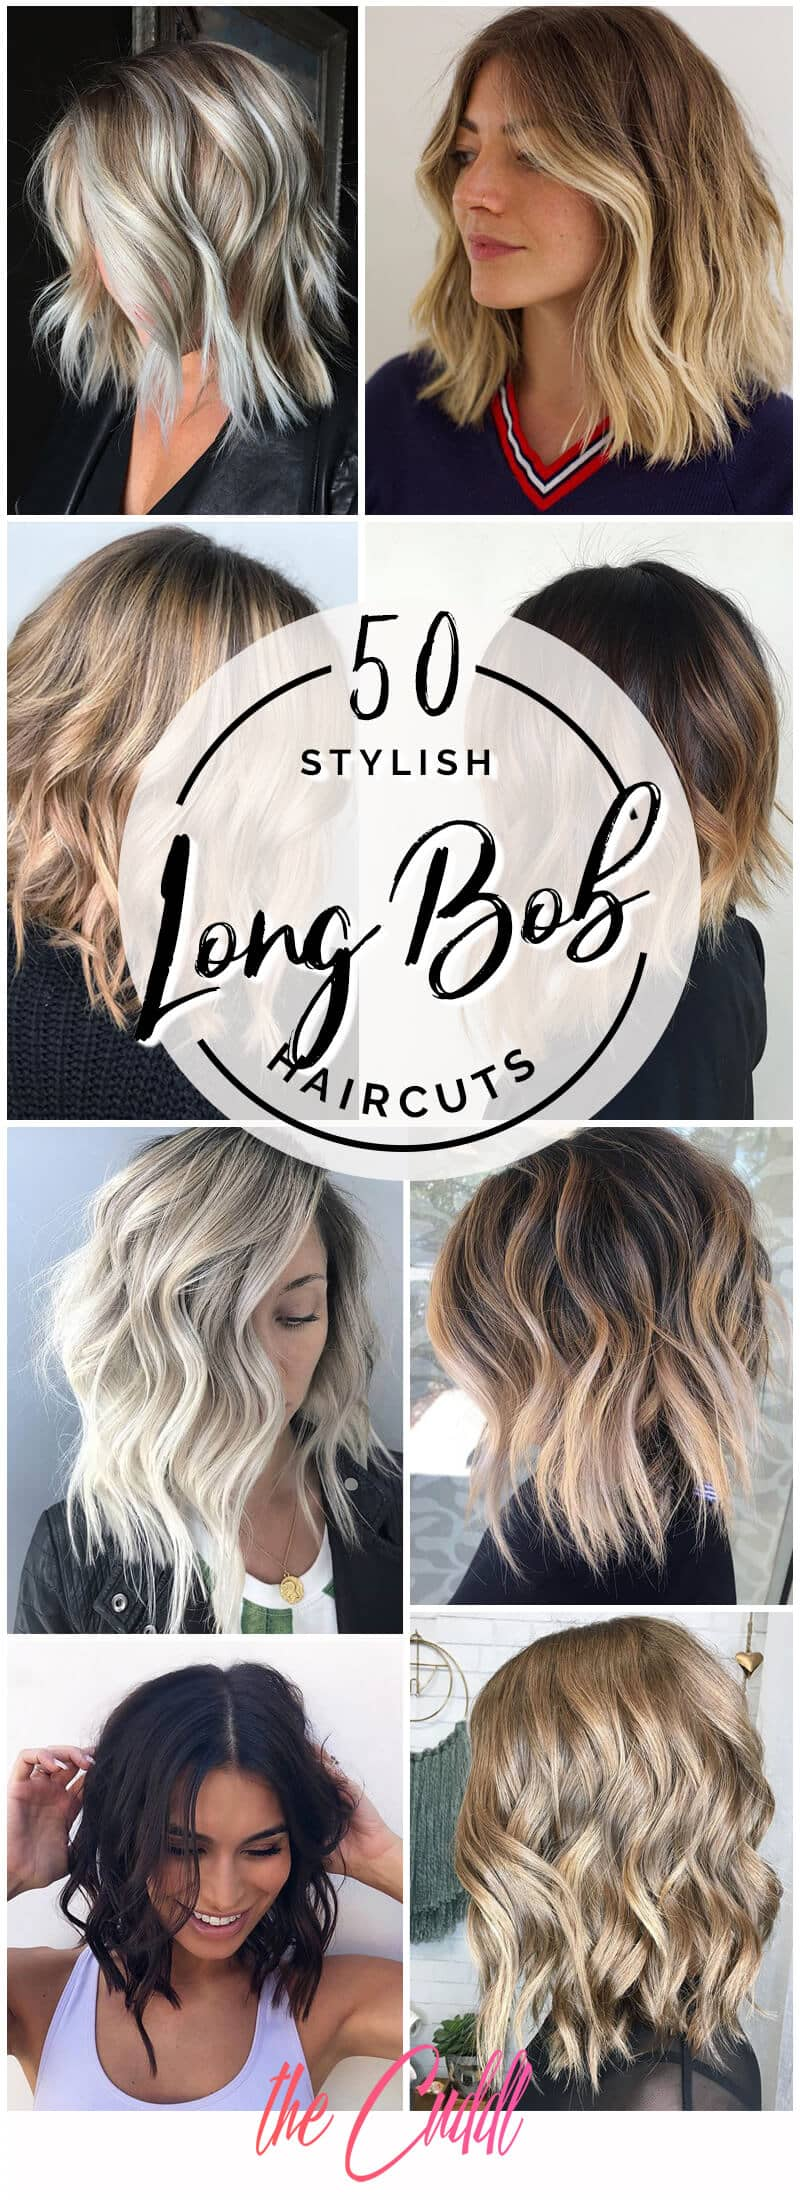 50 Stylish Long Bob Haircuts We Adore